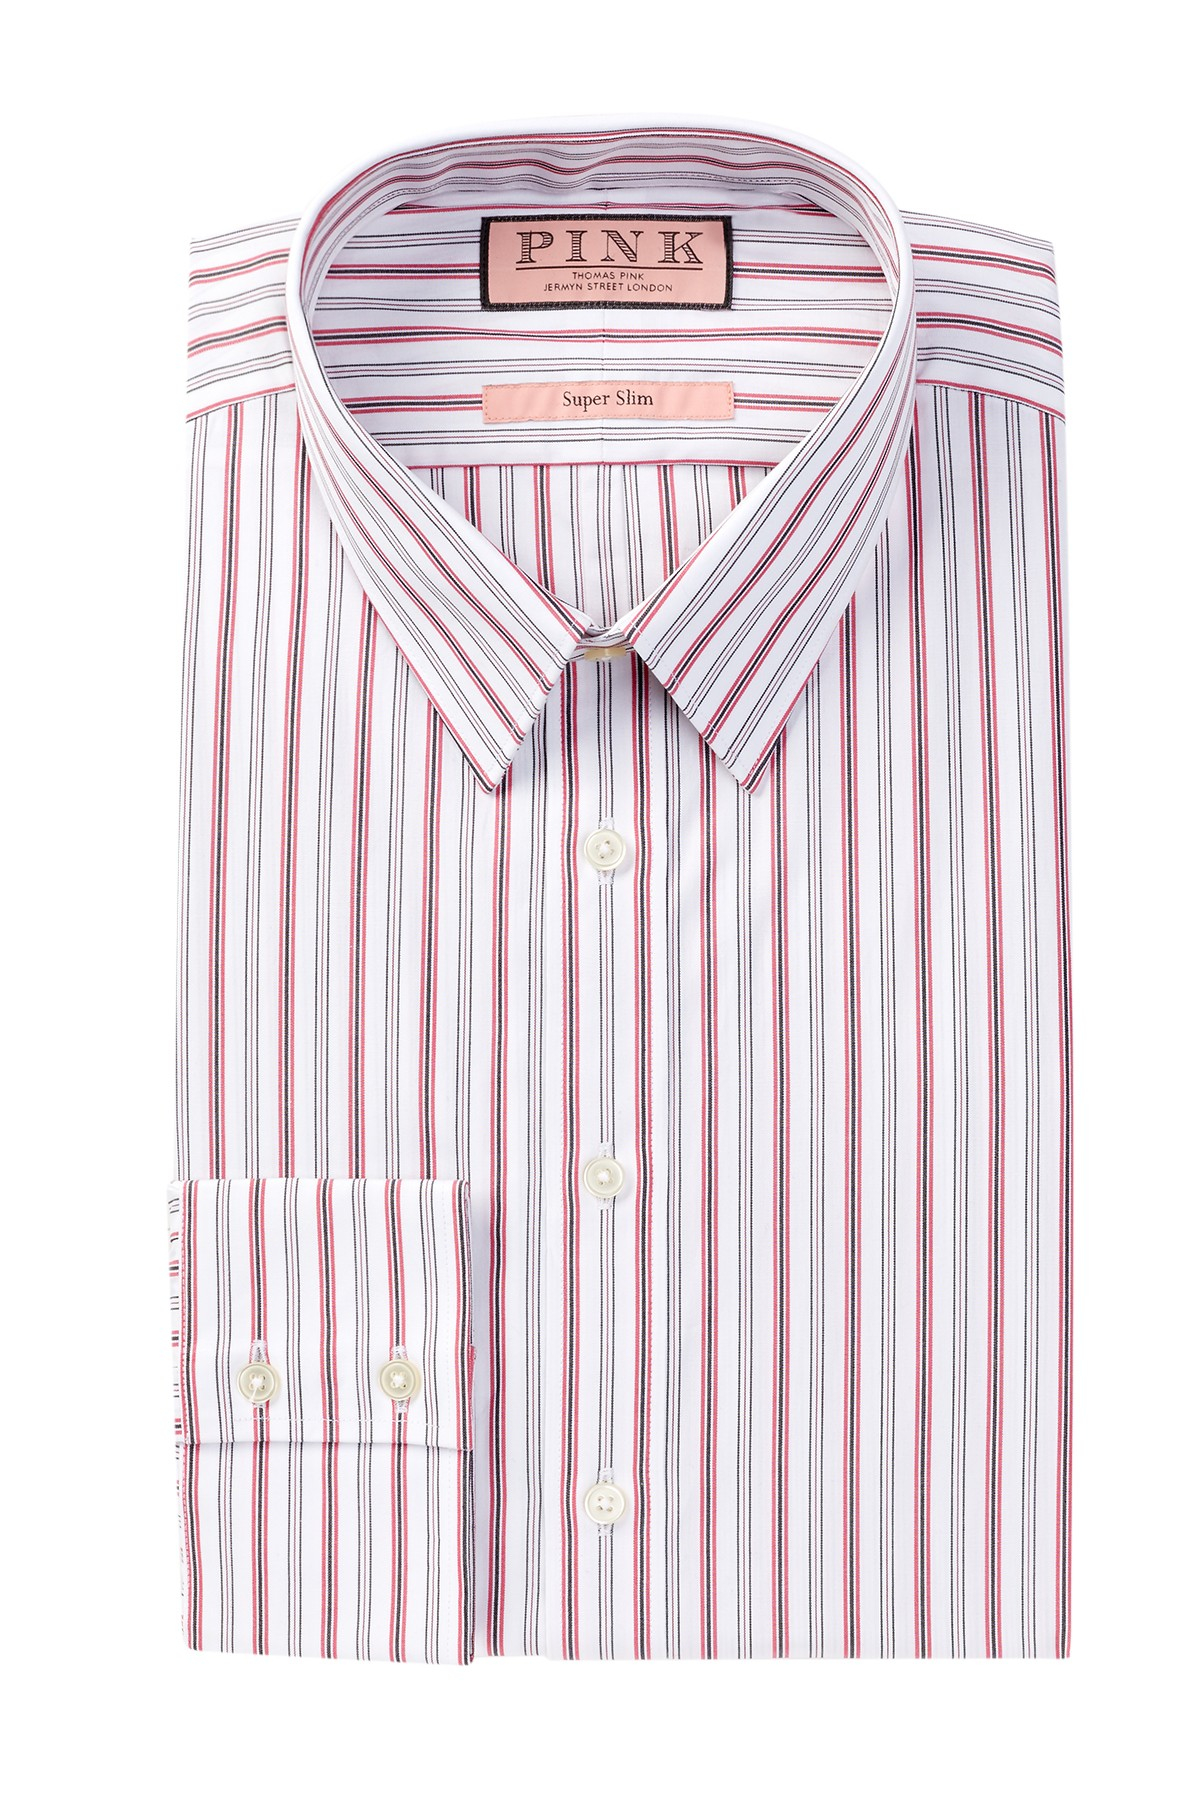 Thomas pink povey long sleeve super slim fit dress shirt for Super slim dress shirts